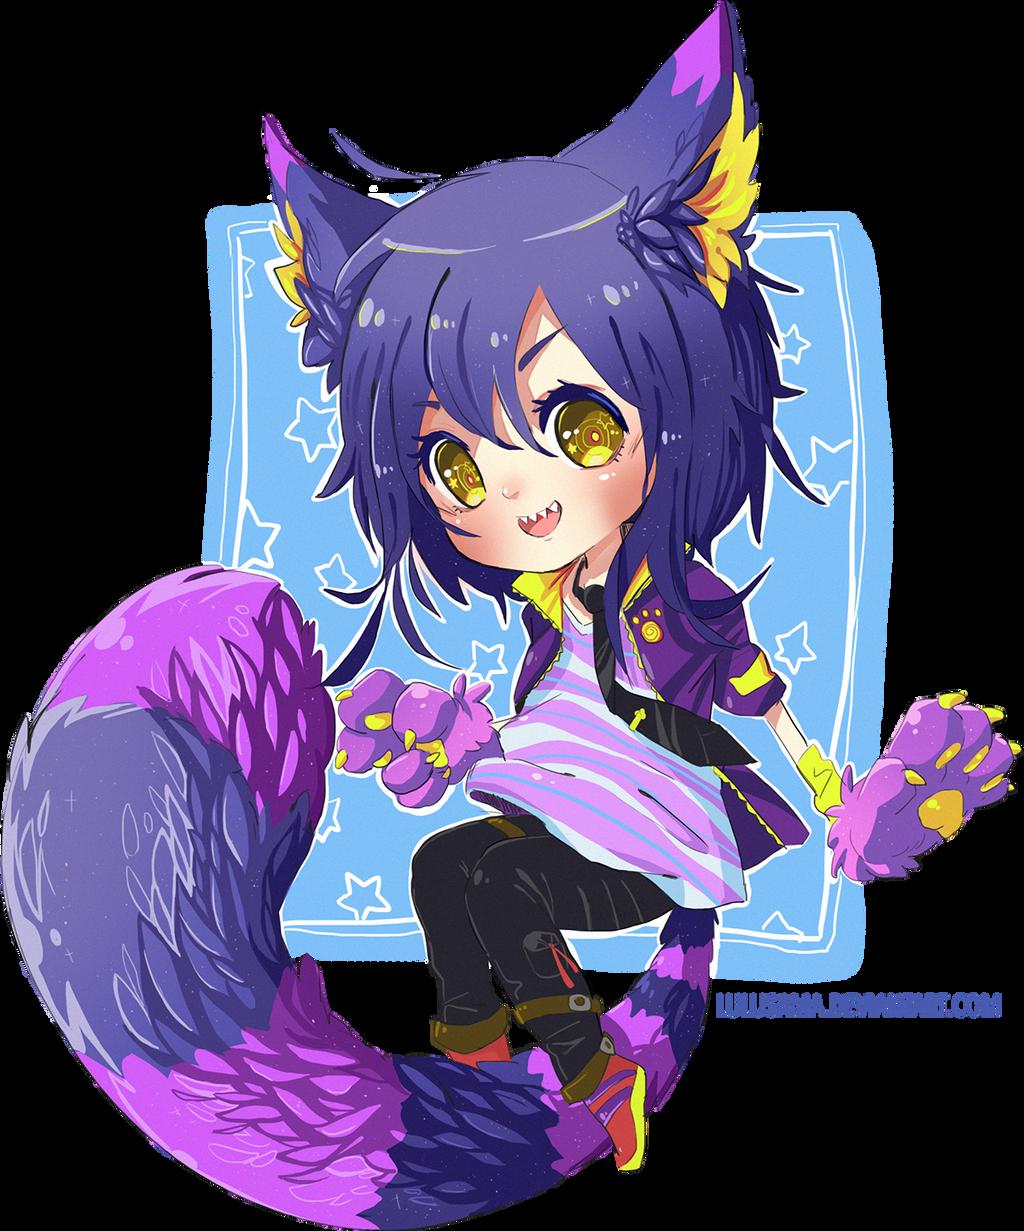 Lulusama's Profile Picture